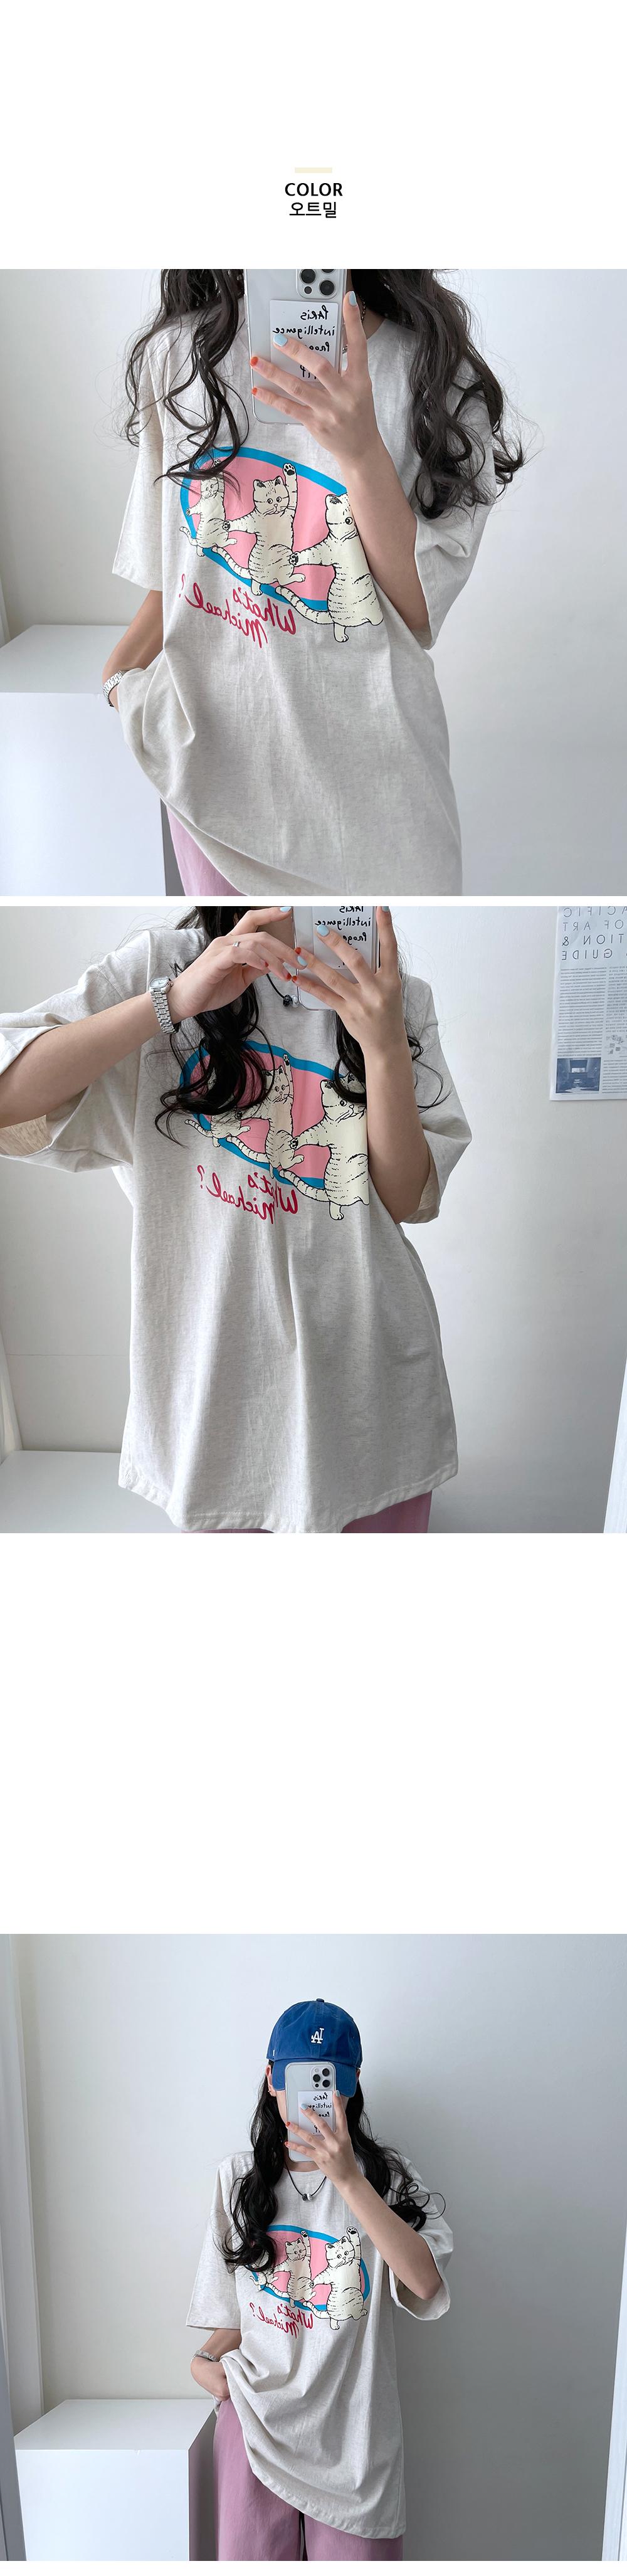 Koneko jjyaeung Boxy Short Sleeve Tee